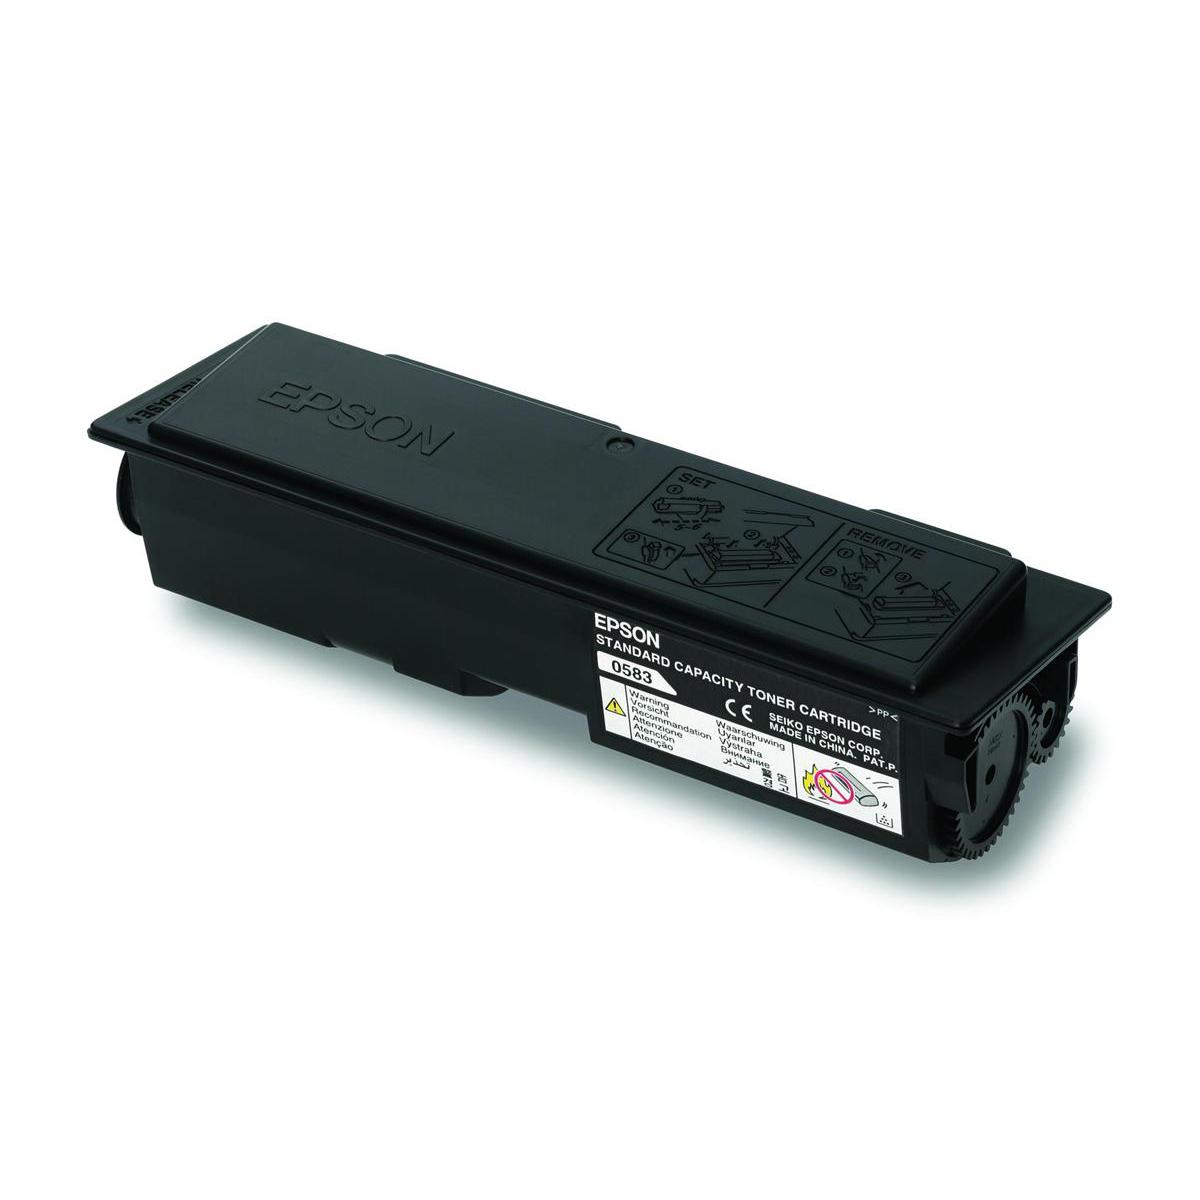 Laser Toner Cartridges Epson S050585 Laser Toner Cartridge Return Programme Page Life 3000pp Black Ref C13S050585